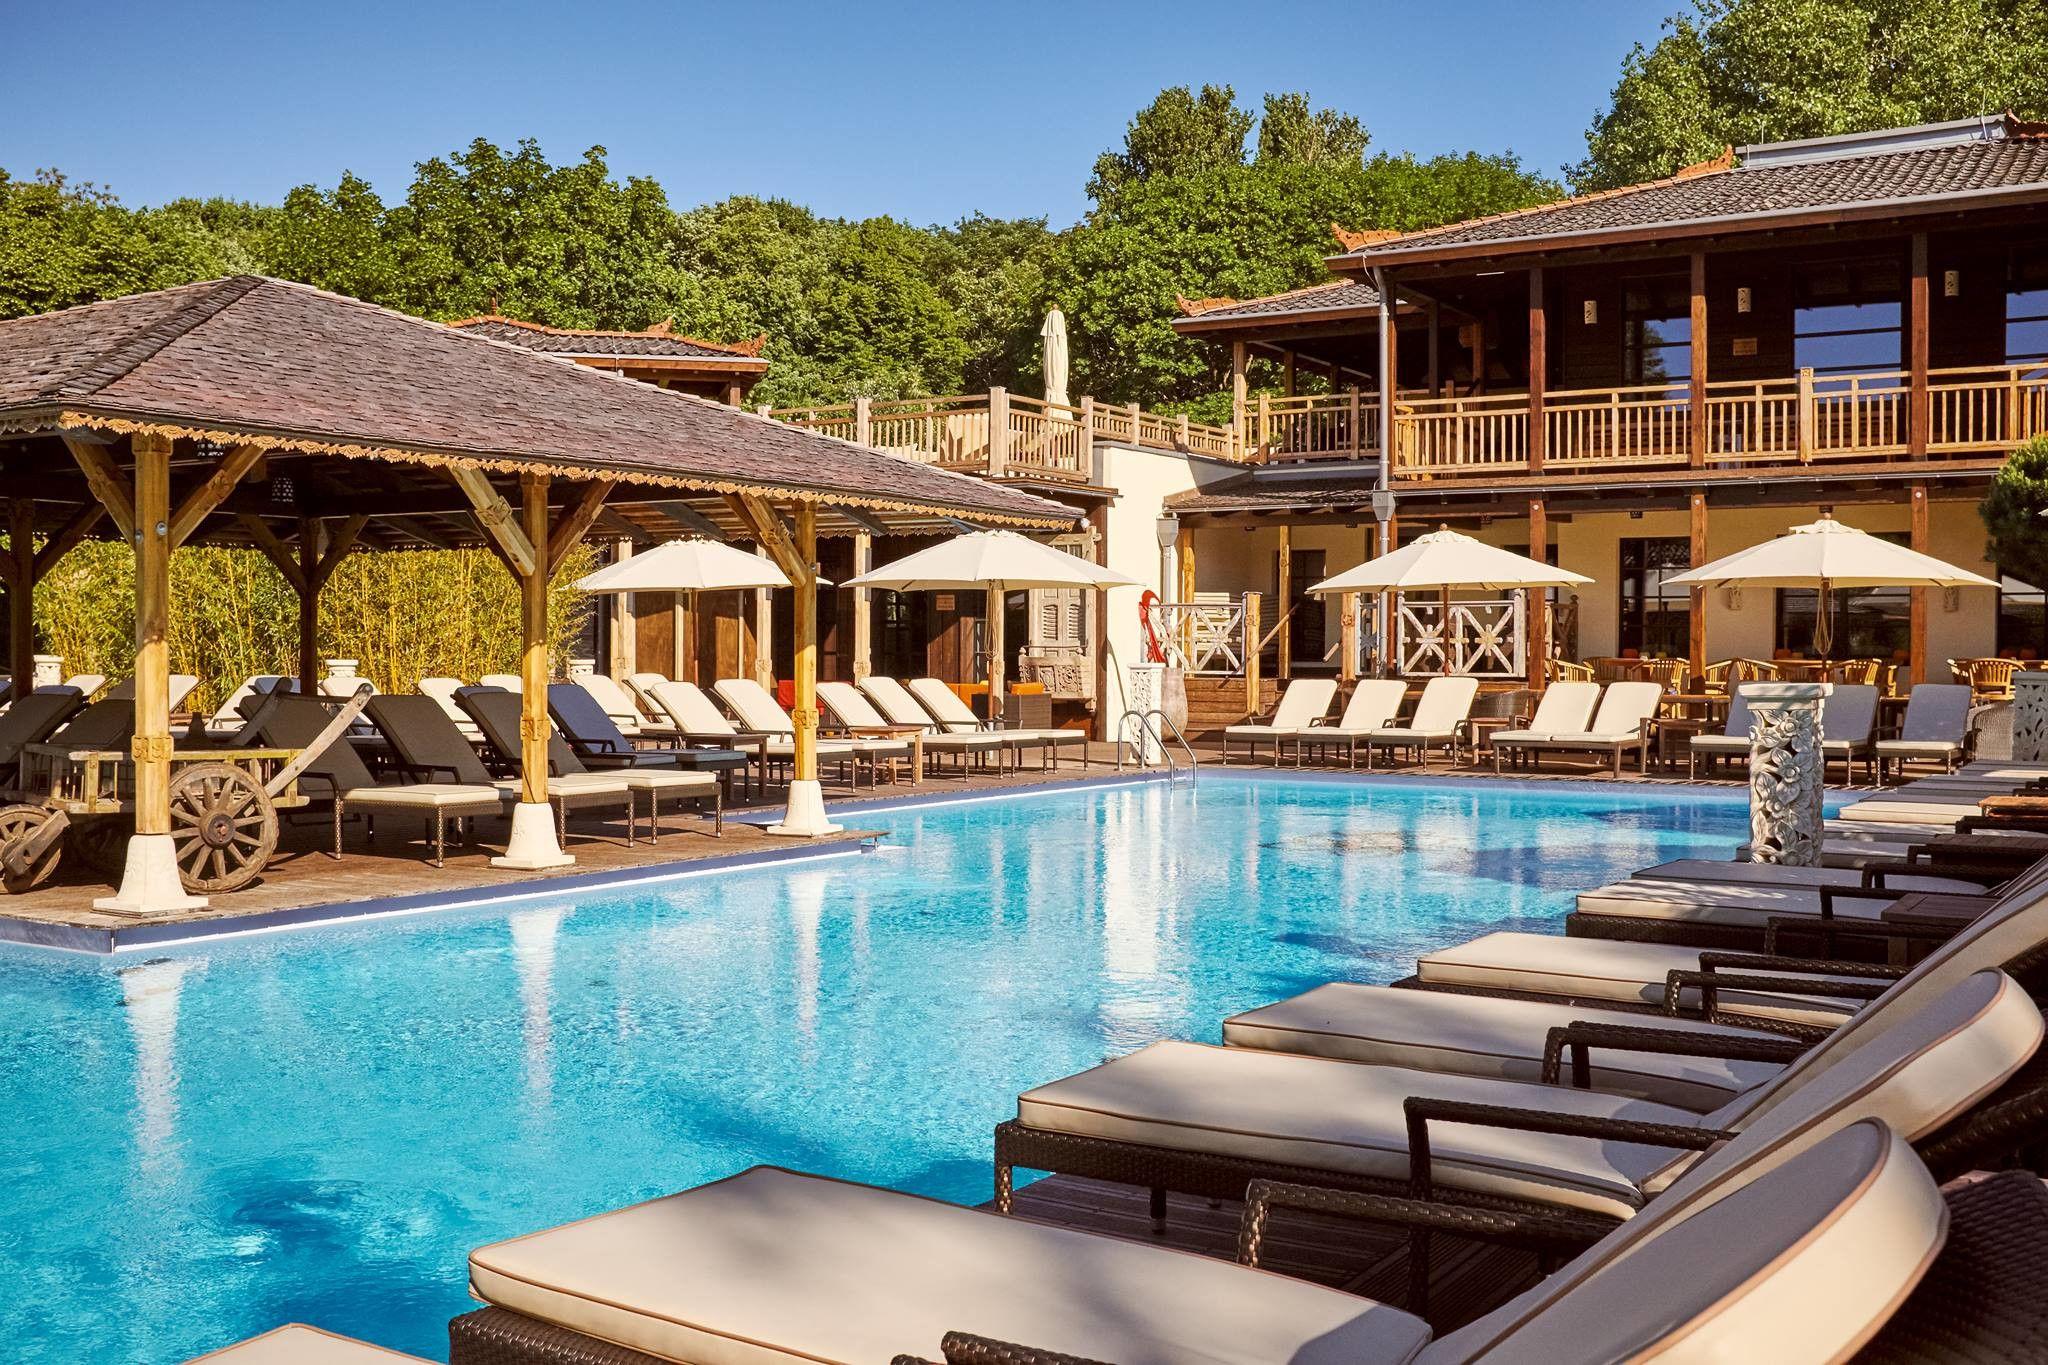 Pool and lounge chairs at Vabali Spa